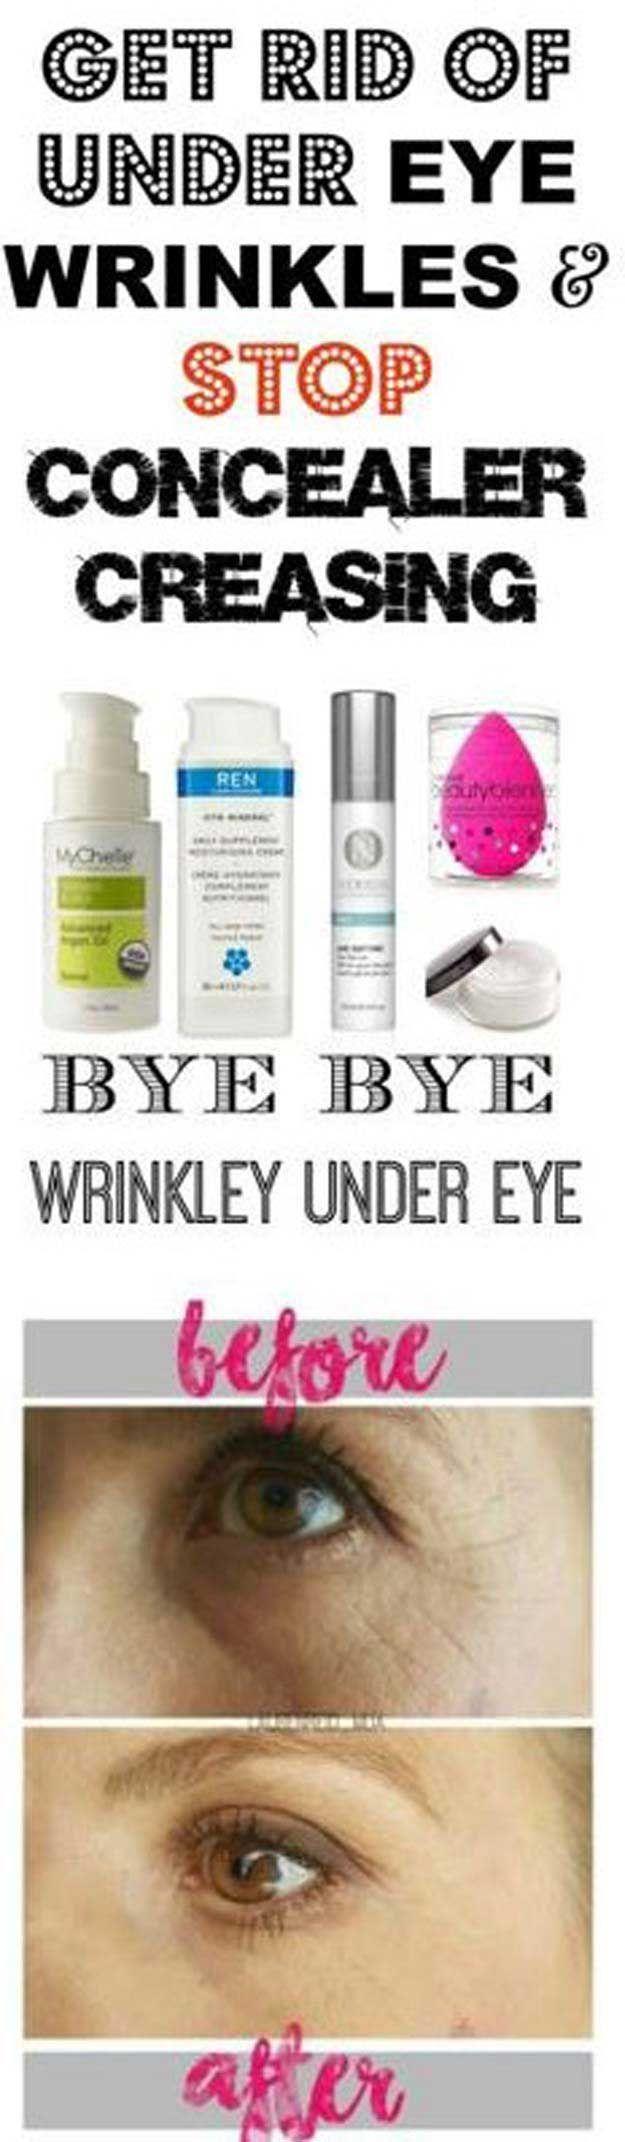 32 Makeup Tips That Make Wrinkles Vanish Under eye